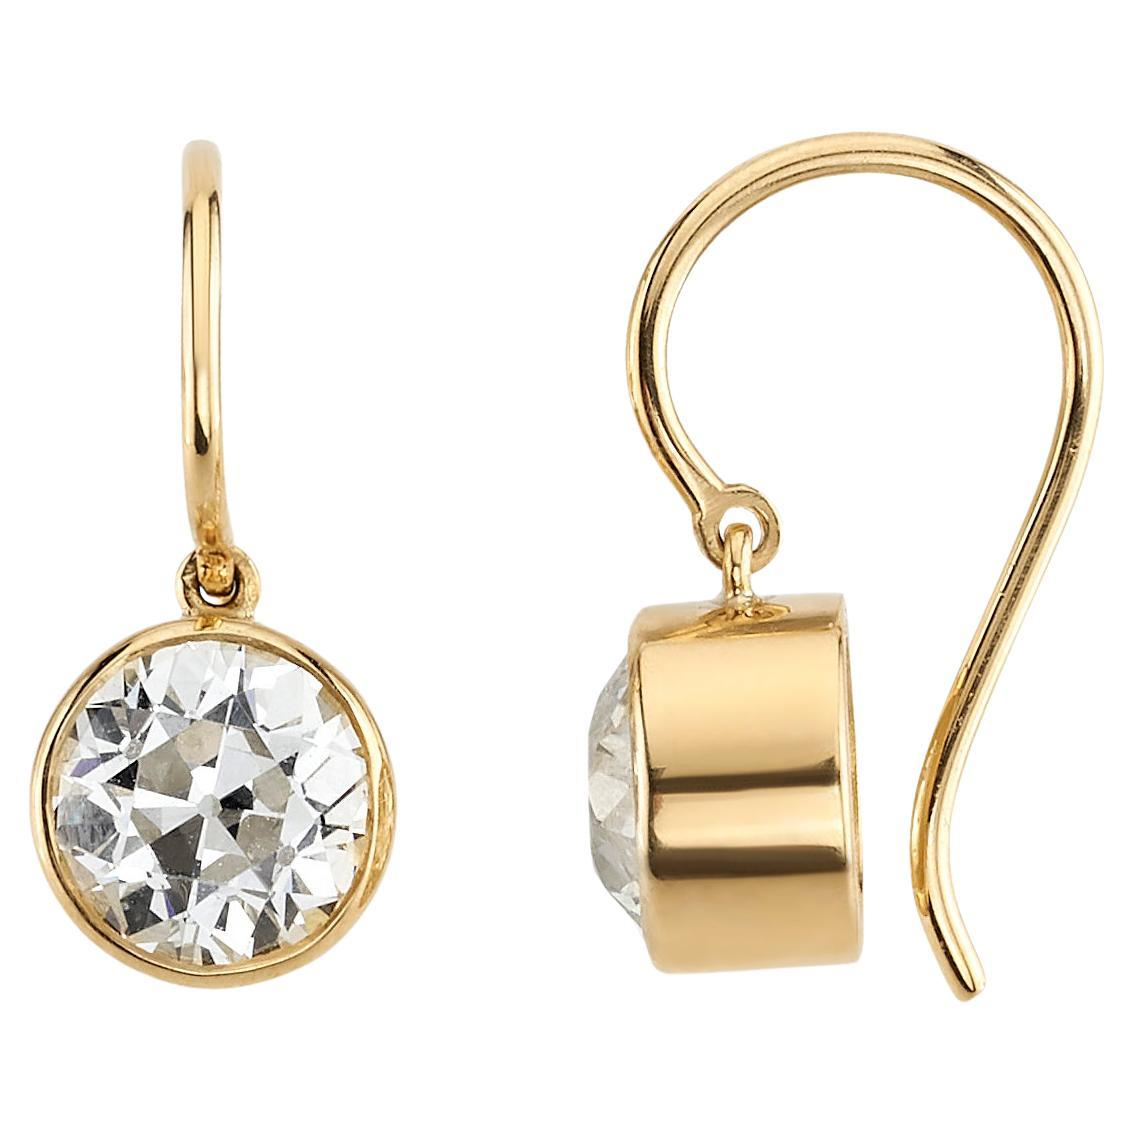 Handcrafted Lucia Old European Cut Diamond Drop Earrings by Single Stone